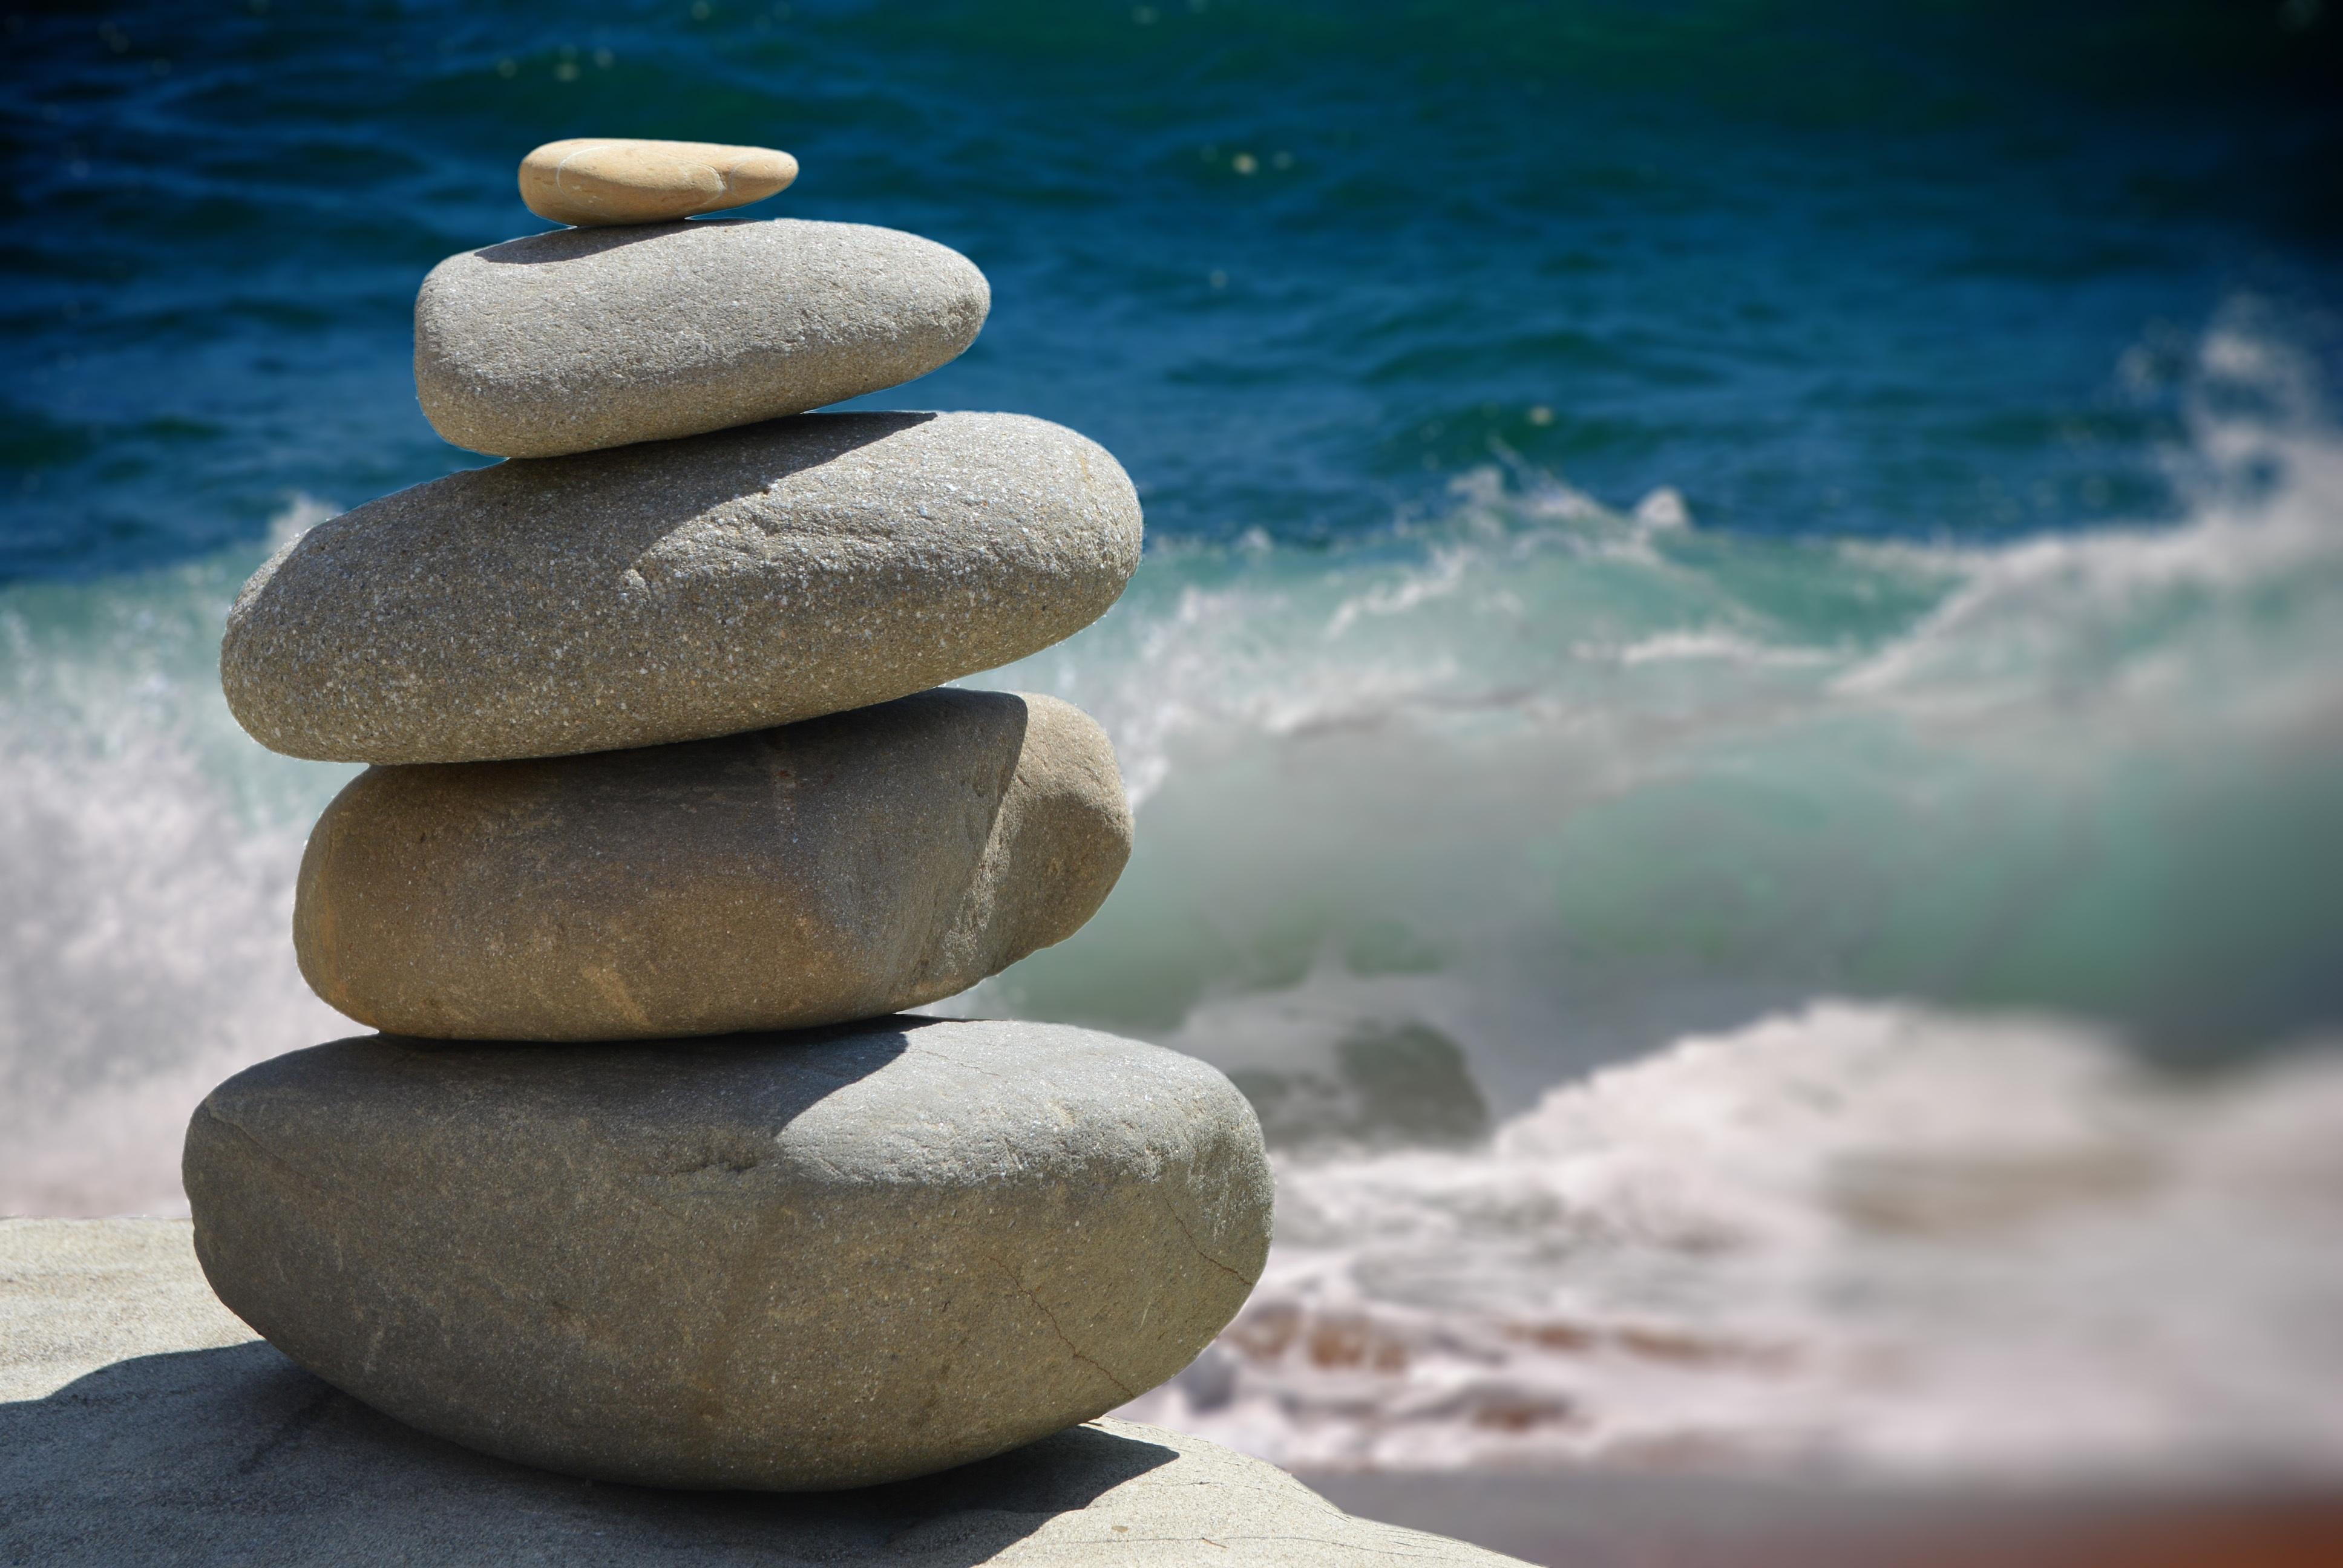 Fotos gratis mar costa arena rock oceano estructura for Fotos piedras zen